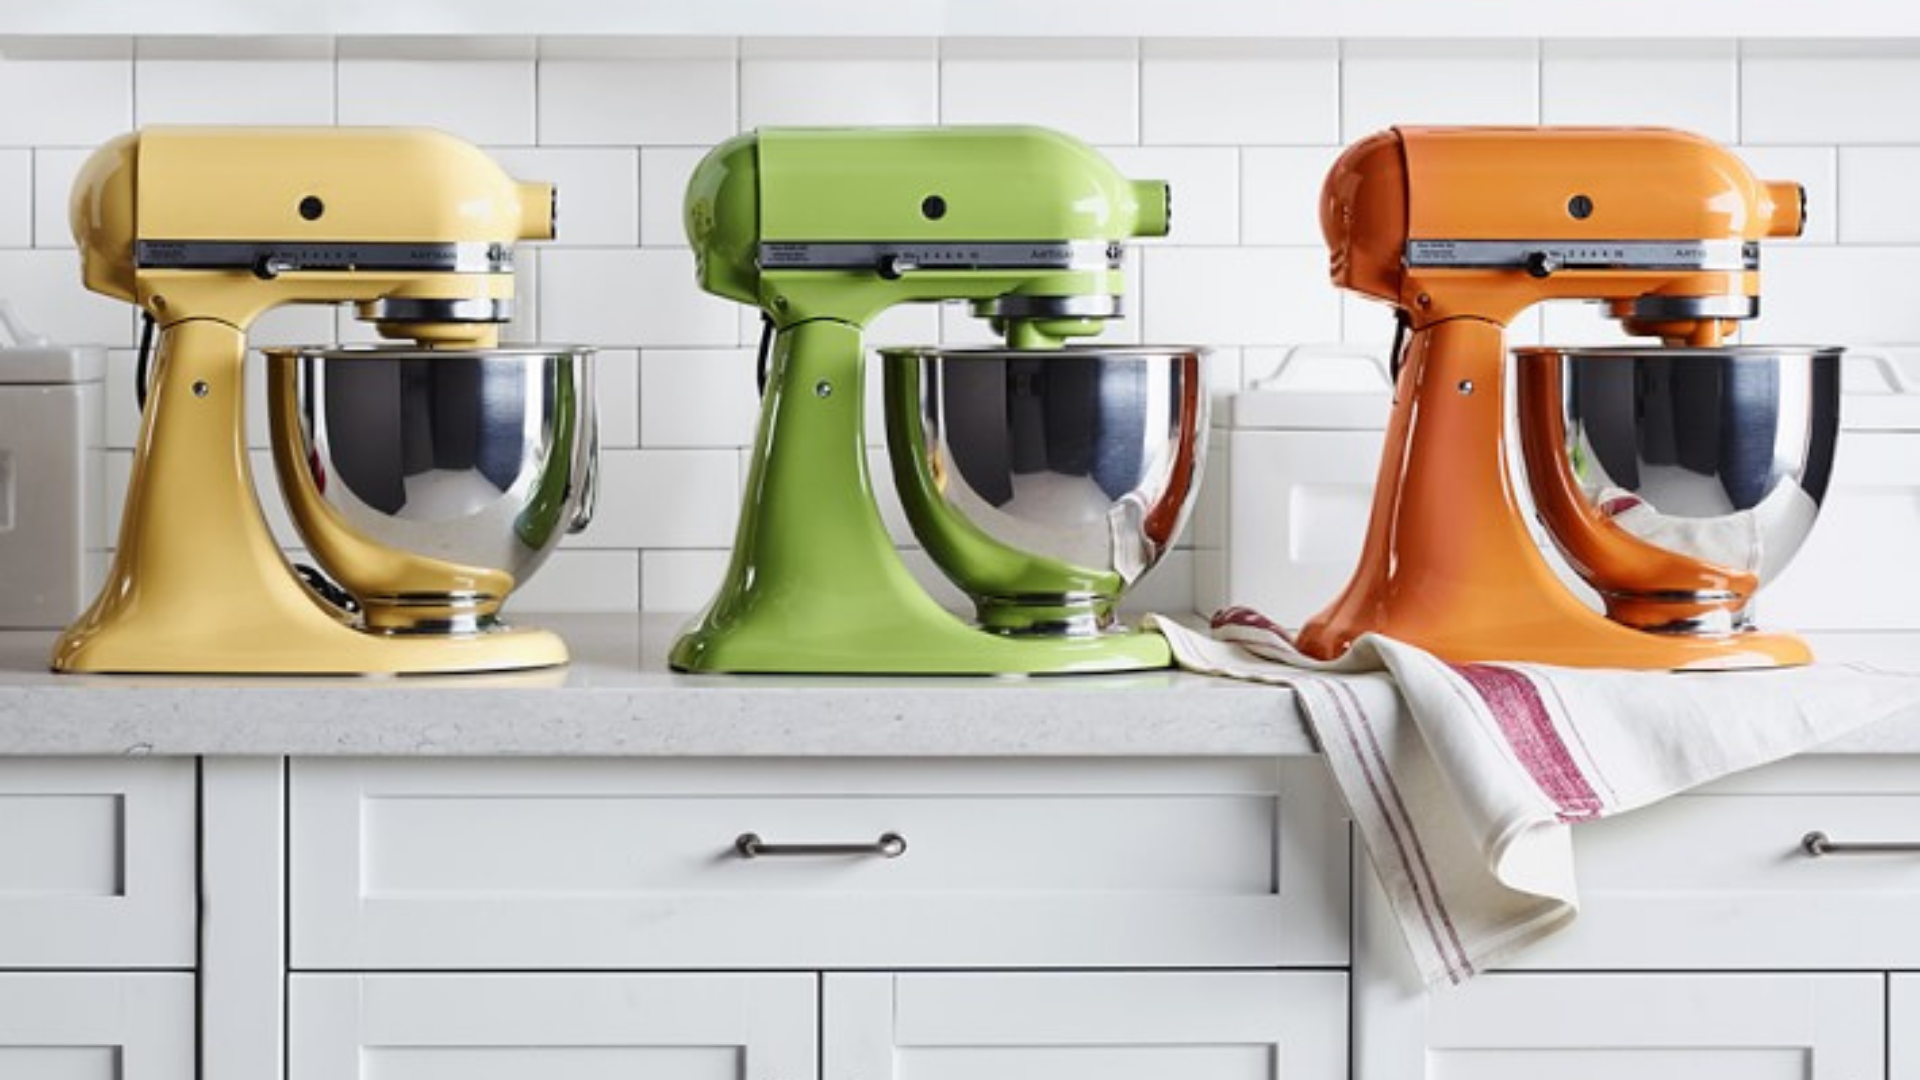 Cyber Monday 2020 Get The Kitchenaid Artisan 5 Quart Stand Mixer On Sale